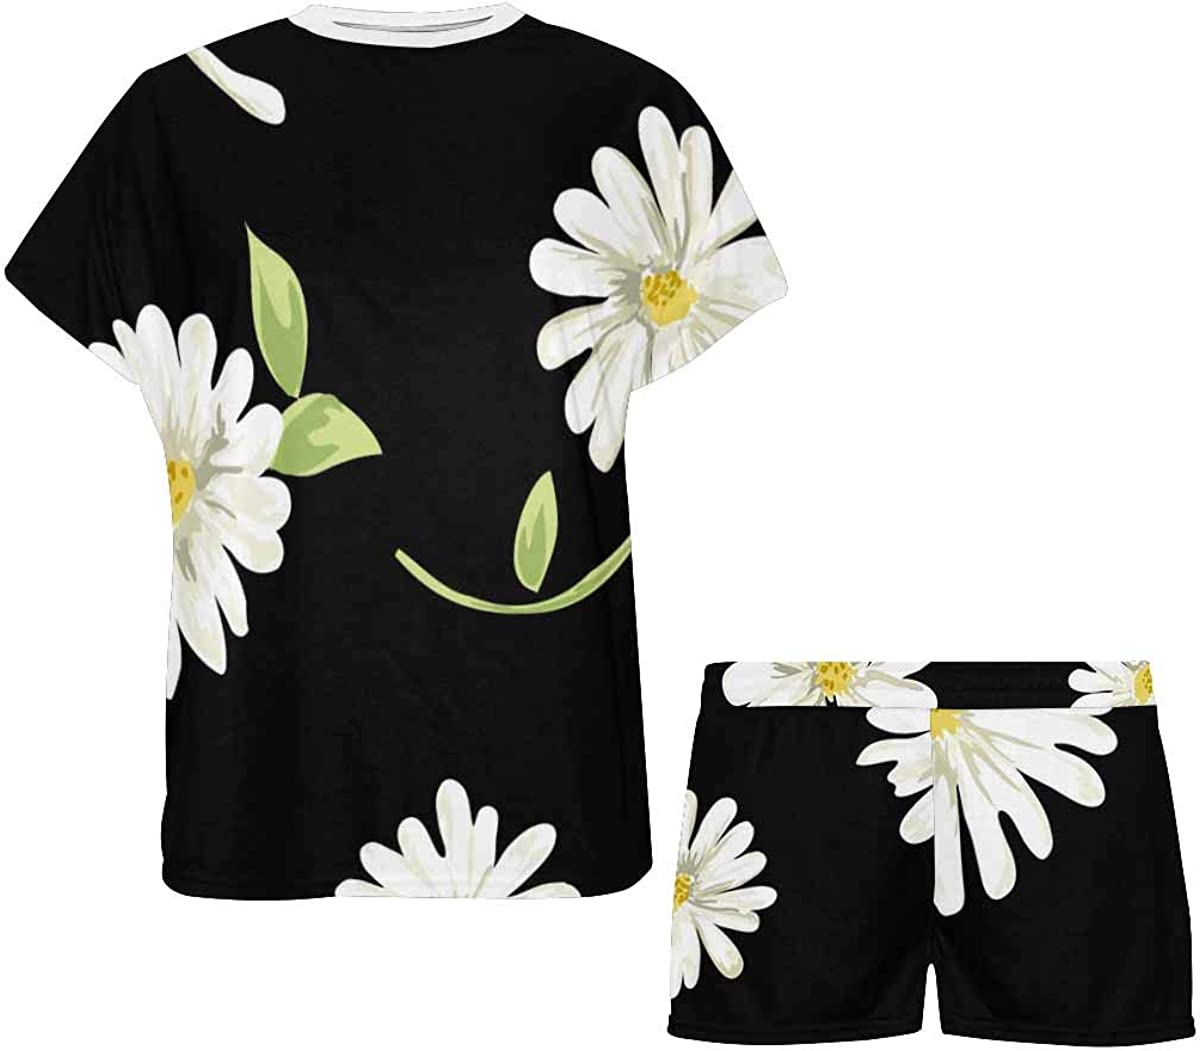 InterestPrint Daisy Garden Print on Black Women's Lightweight Pajama Set, Short Summer Pjs